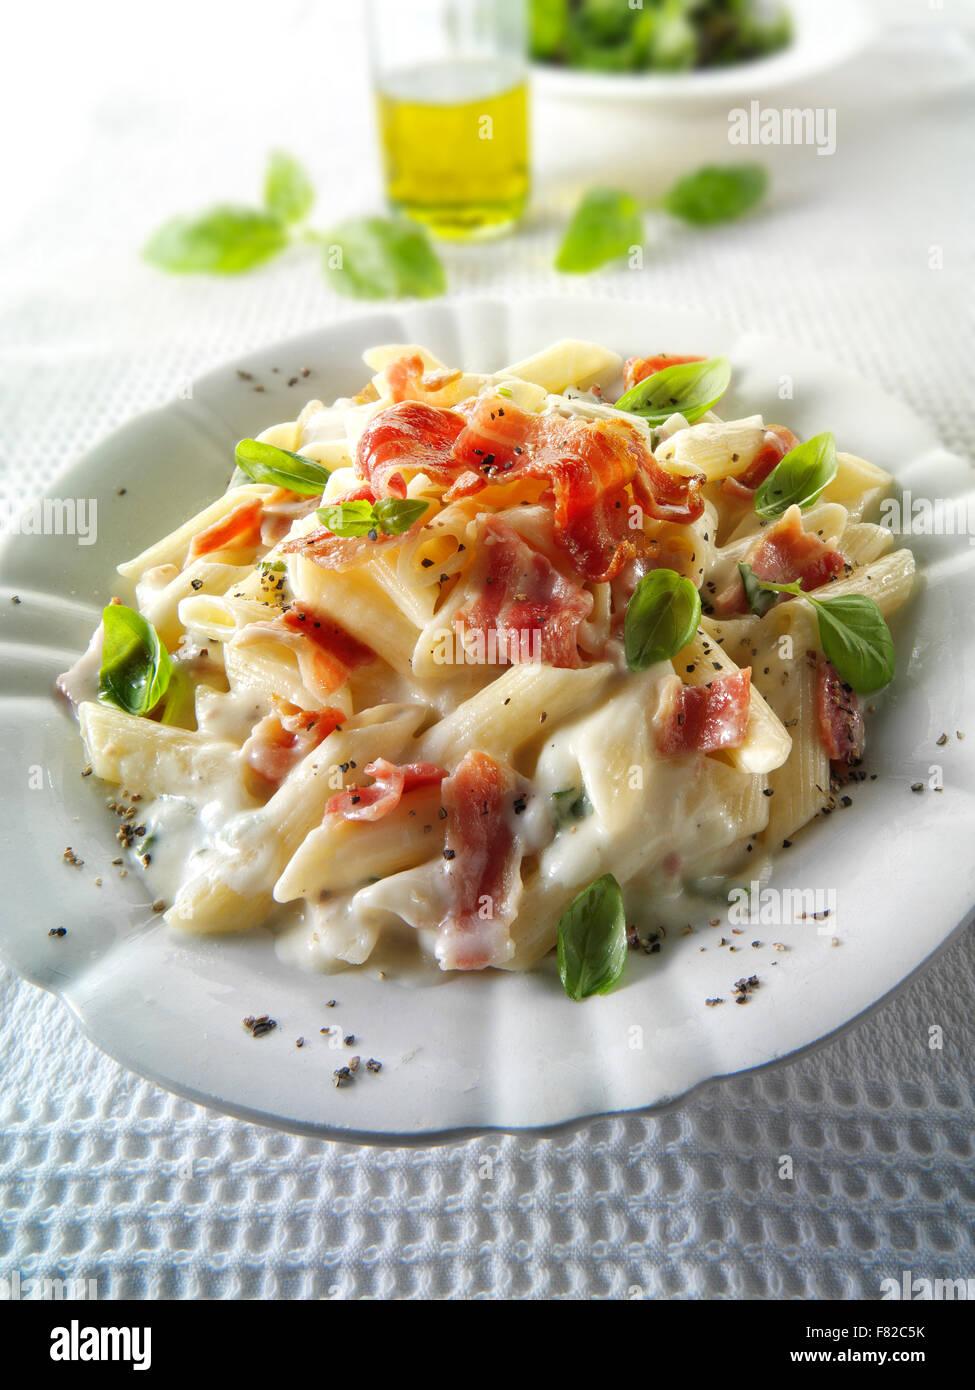 Pene bacon carbonara recipe meal - Stock Image